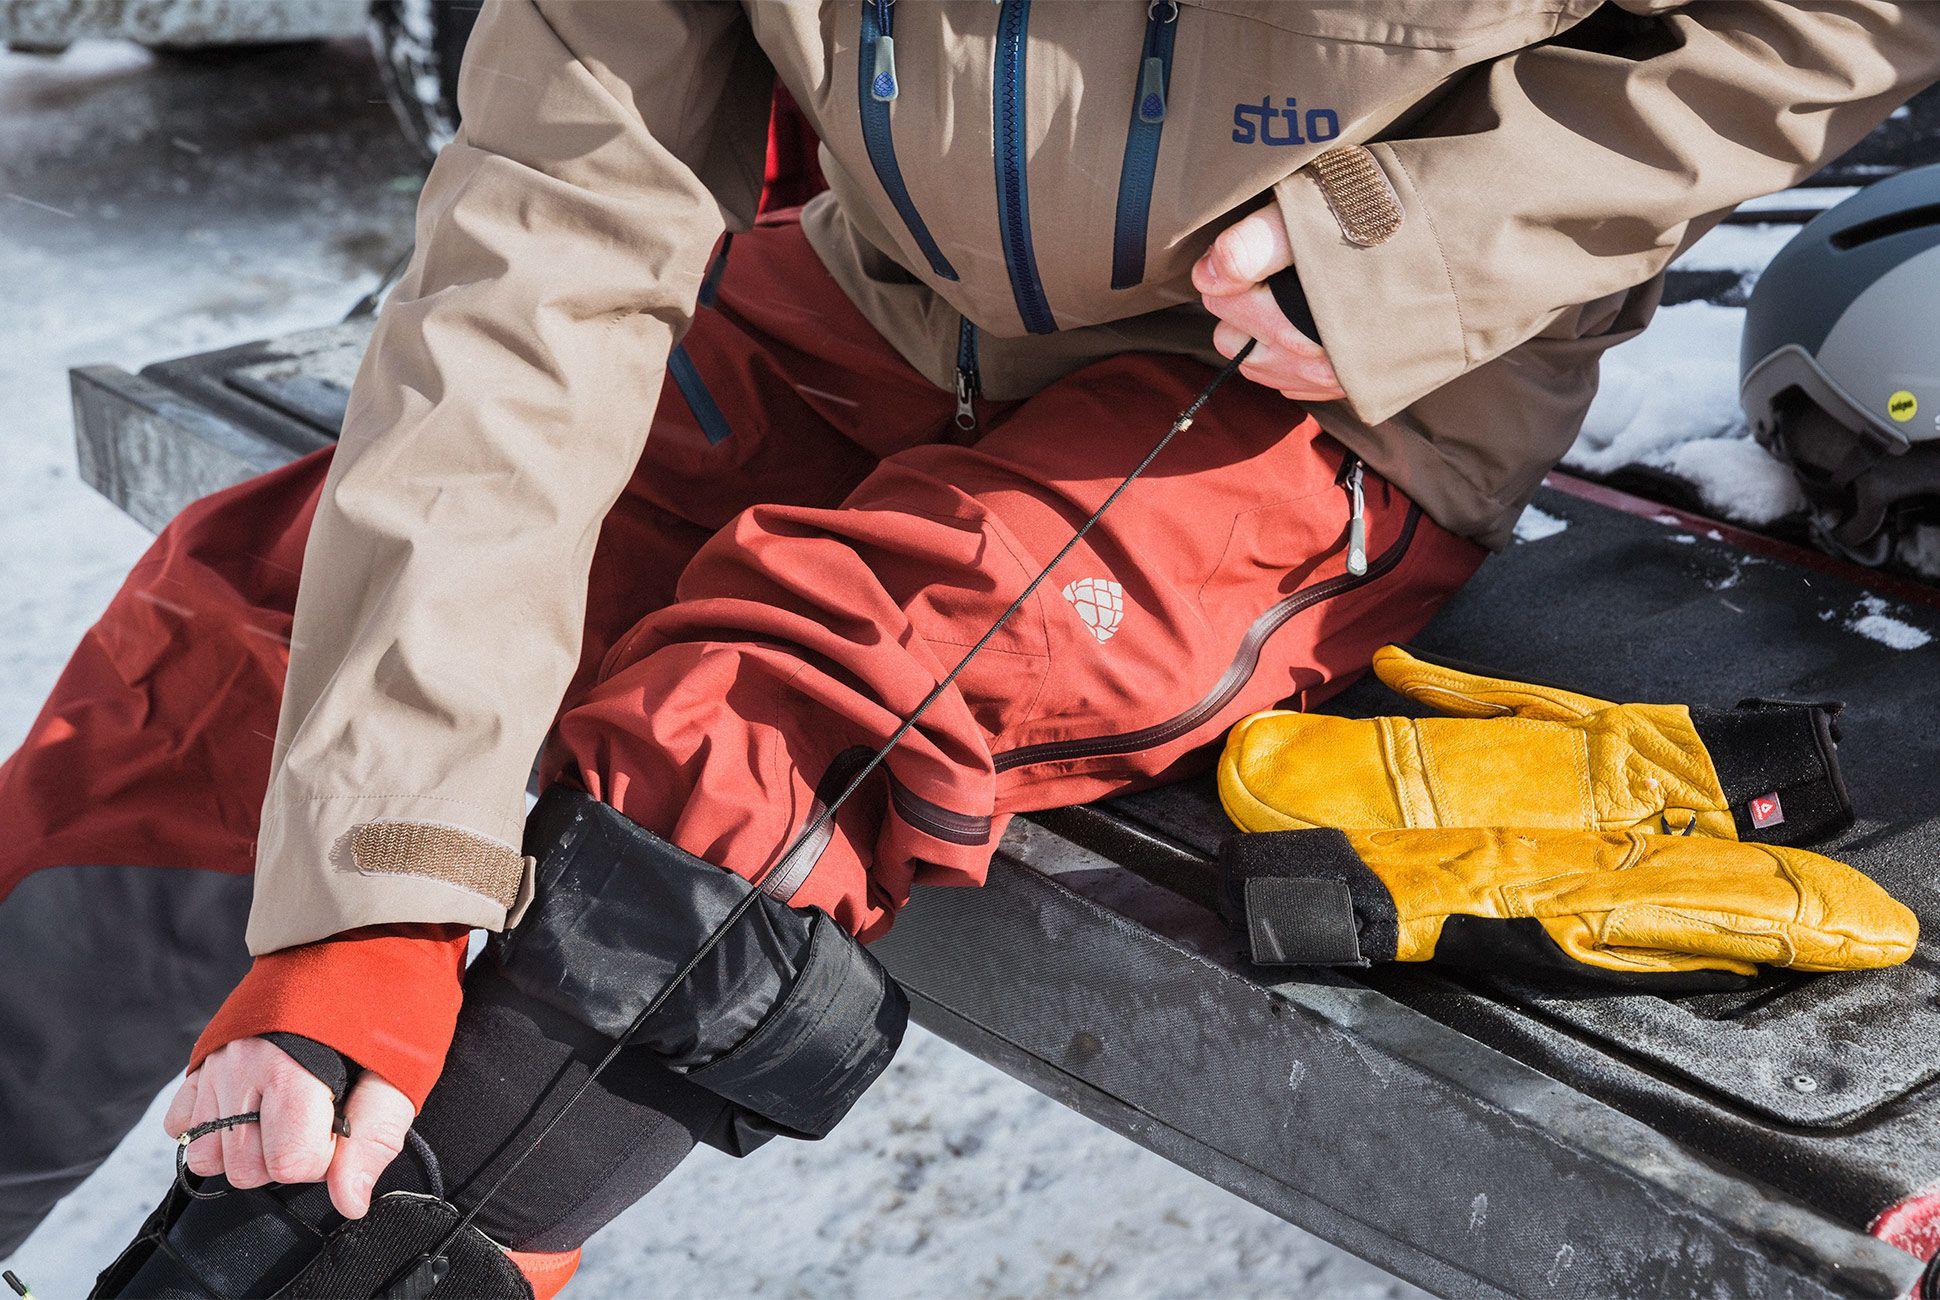 ultimate-ski-and-snow-gear-patrol-stio-slide-4